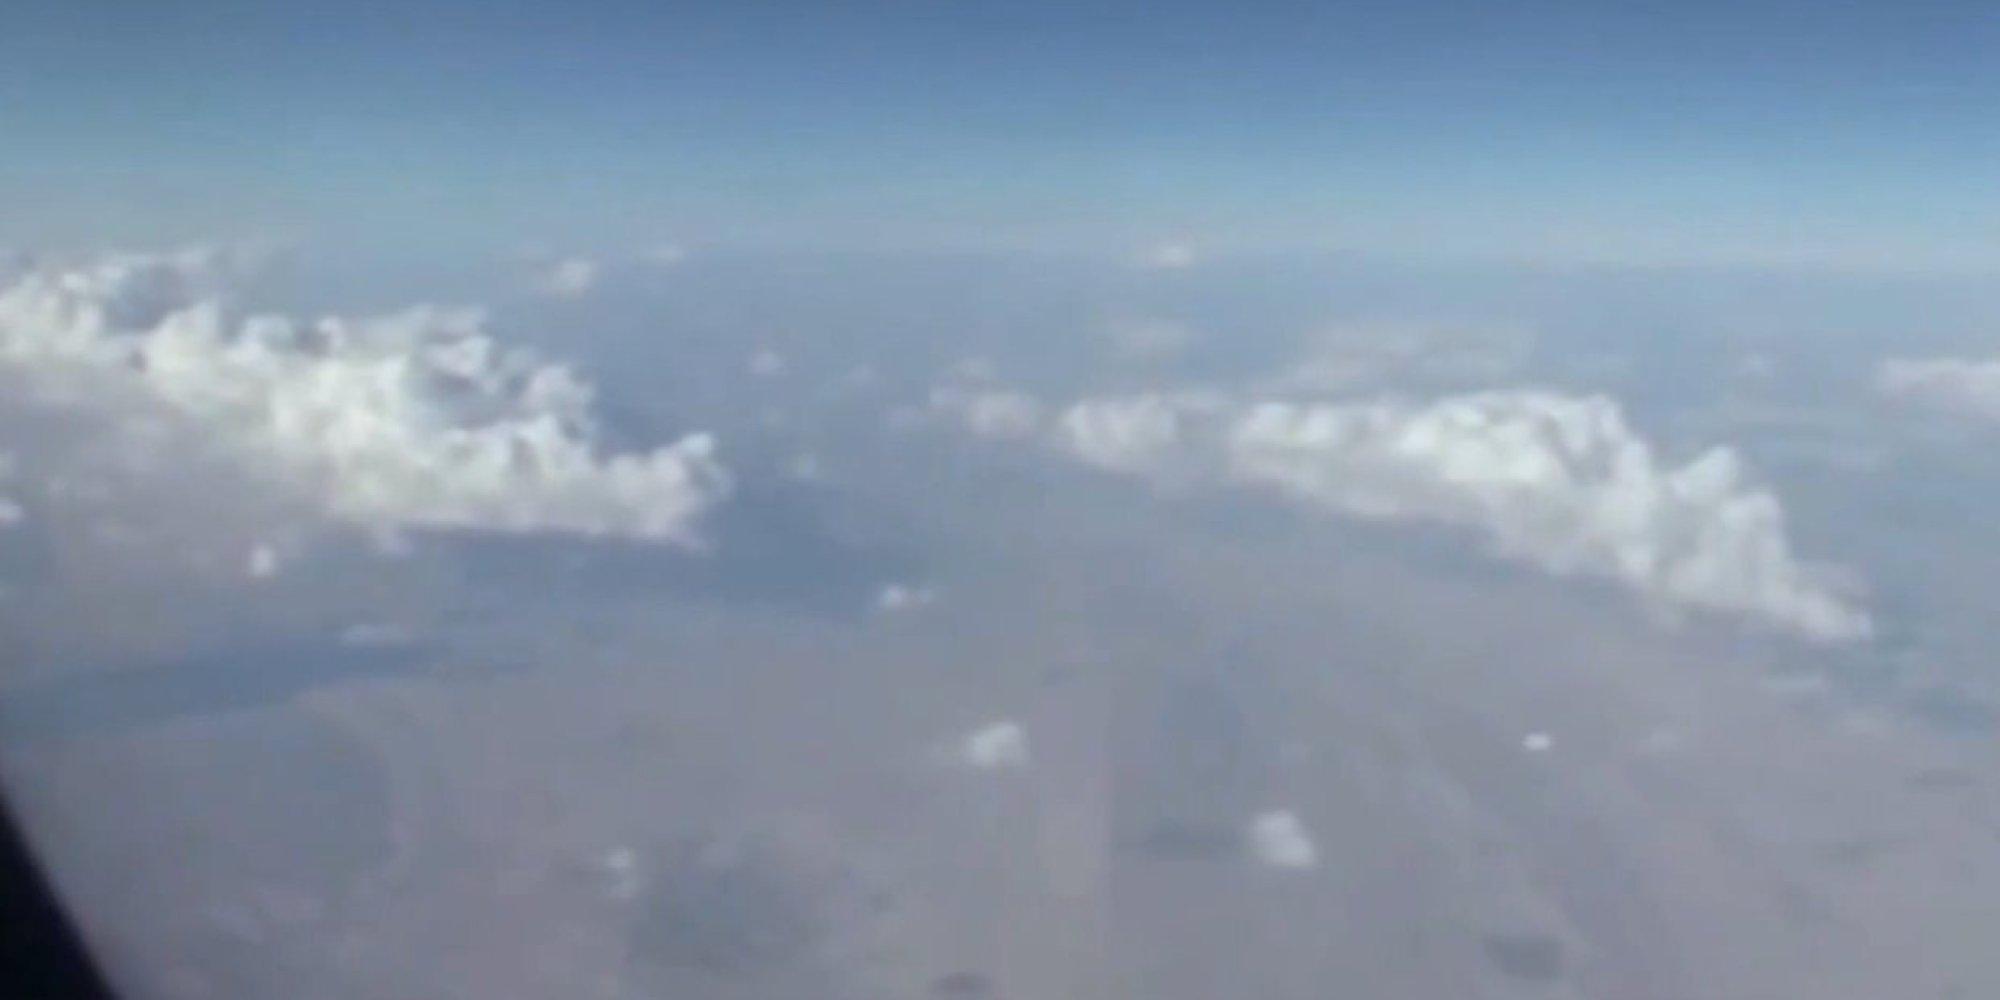 Airline Passenger Films UFO Flying Over Iran